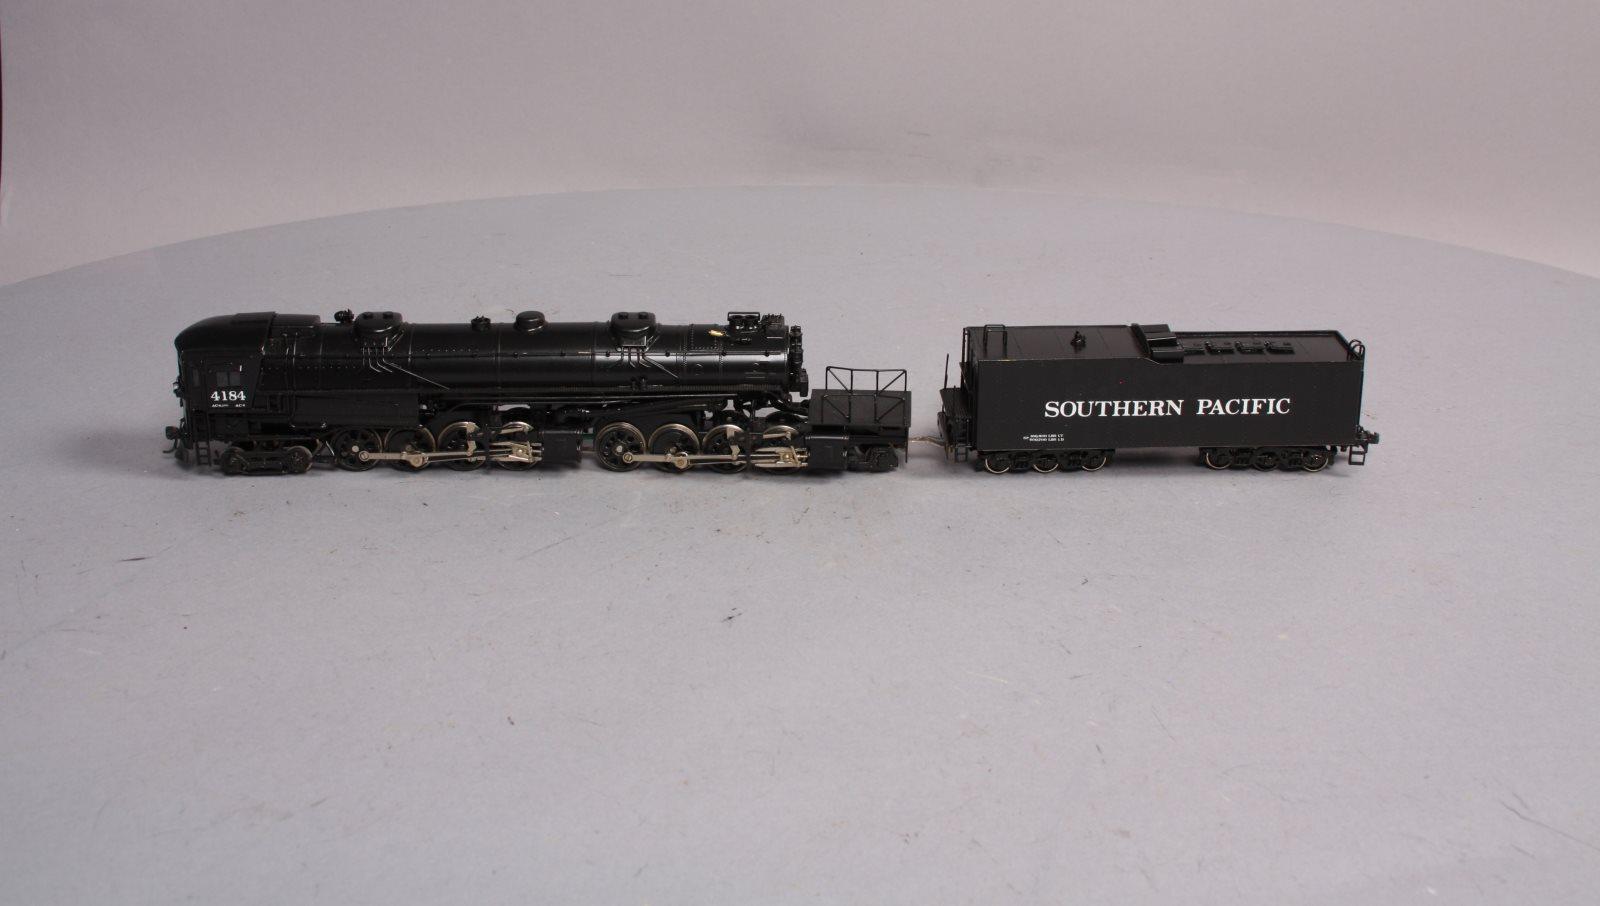 Details about Akane HO BRASS SP Cab Forward 4-8-8-2 Steam Locomotive &  Tender #4184 EX